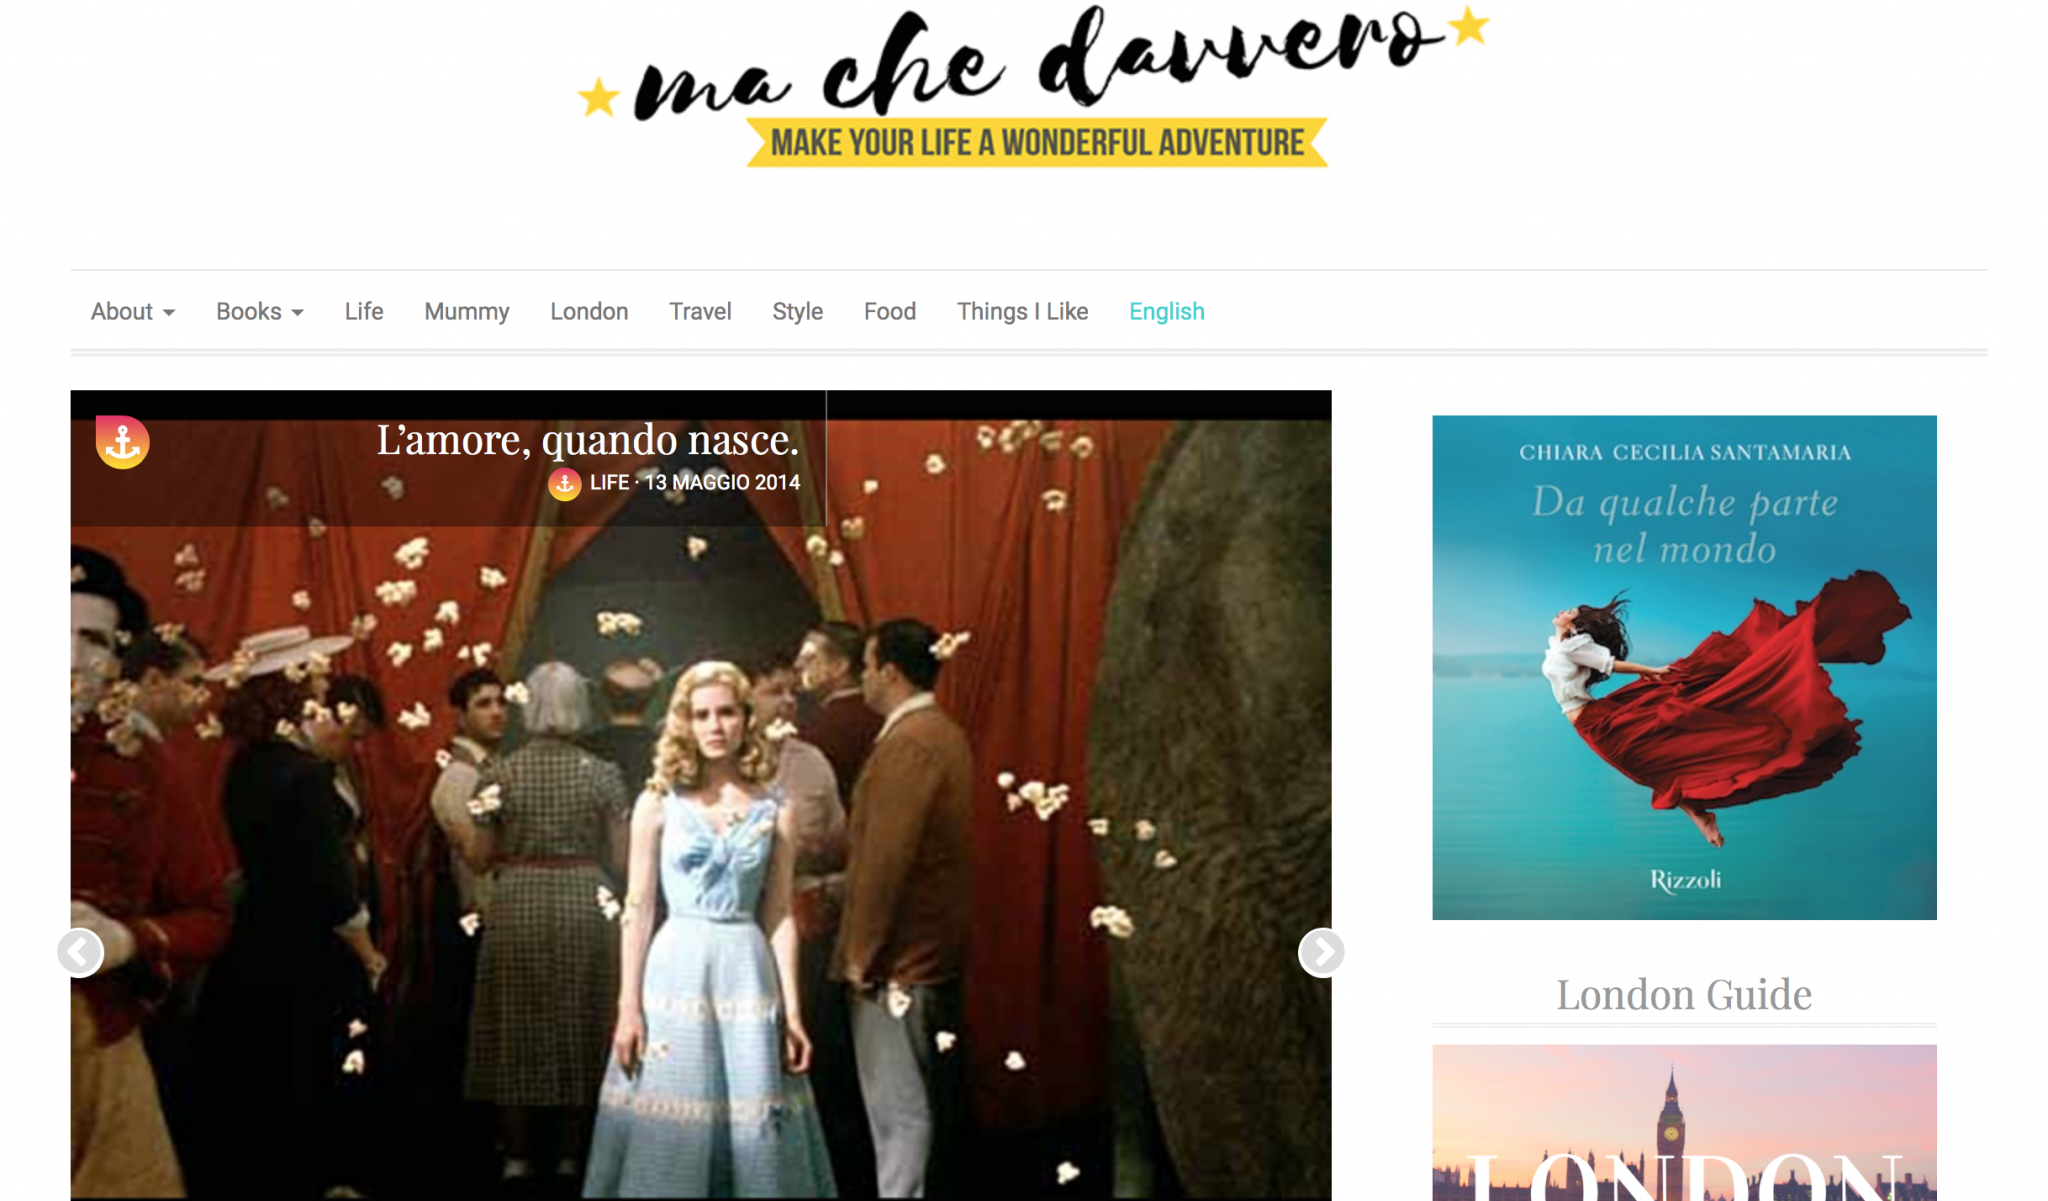 screenshot del blog machedavvero.it - pubblicato da tatianaberlaffa.com